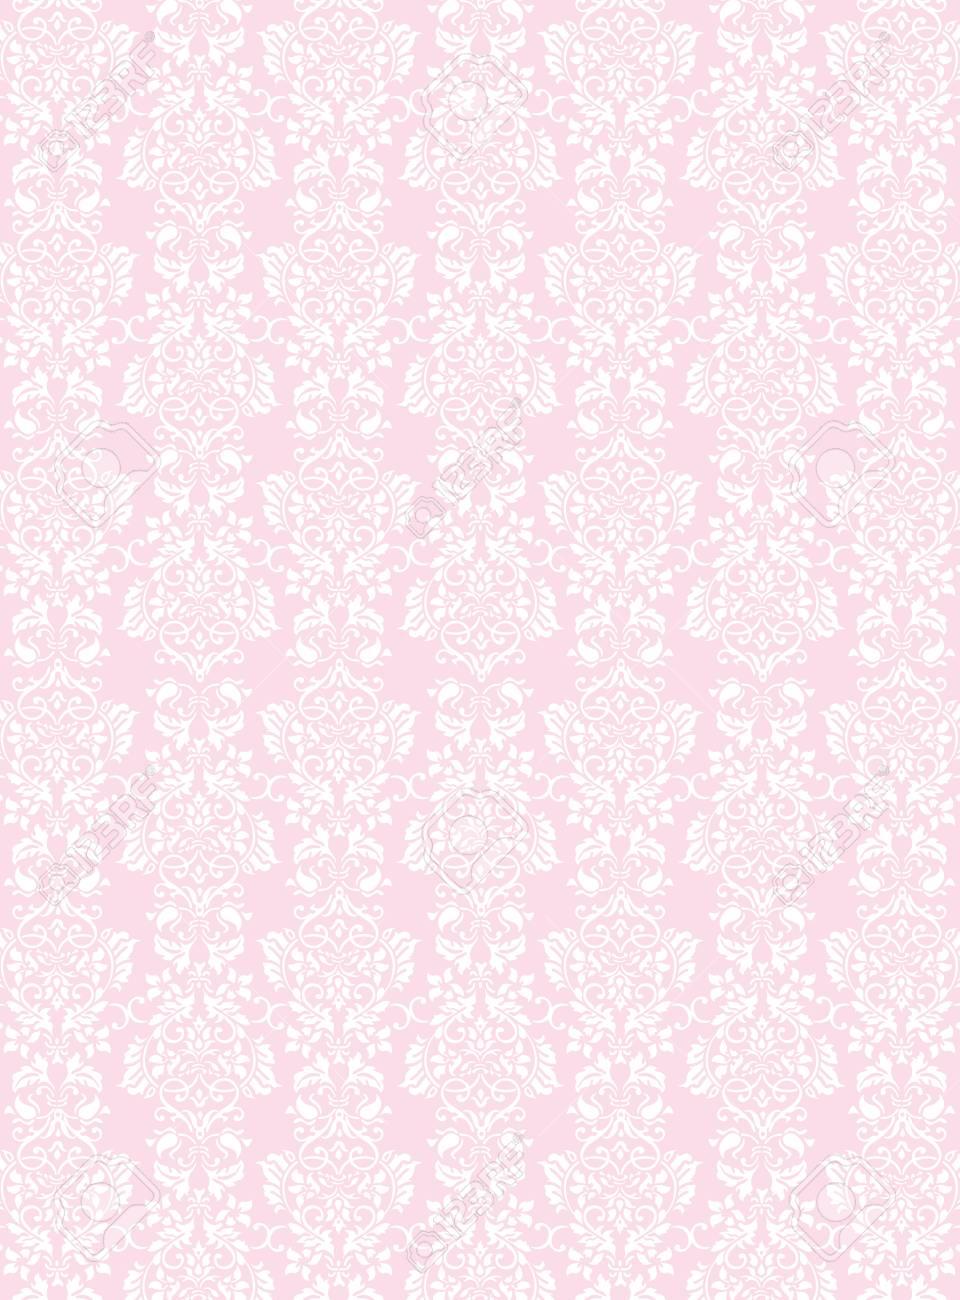 A3 Size Elegant White Flowers Pattern Textured Pink Wallpaper